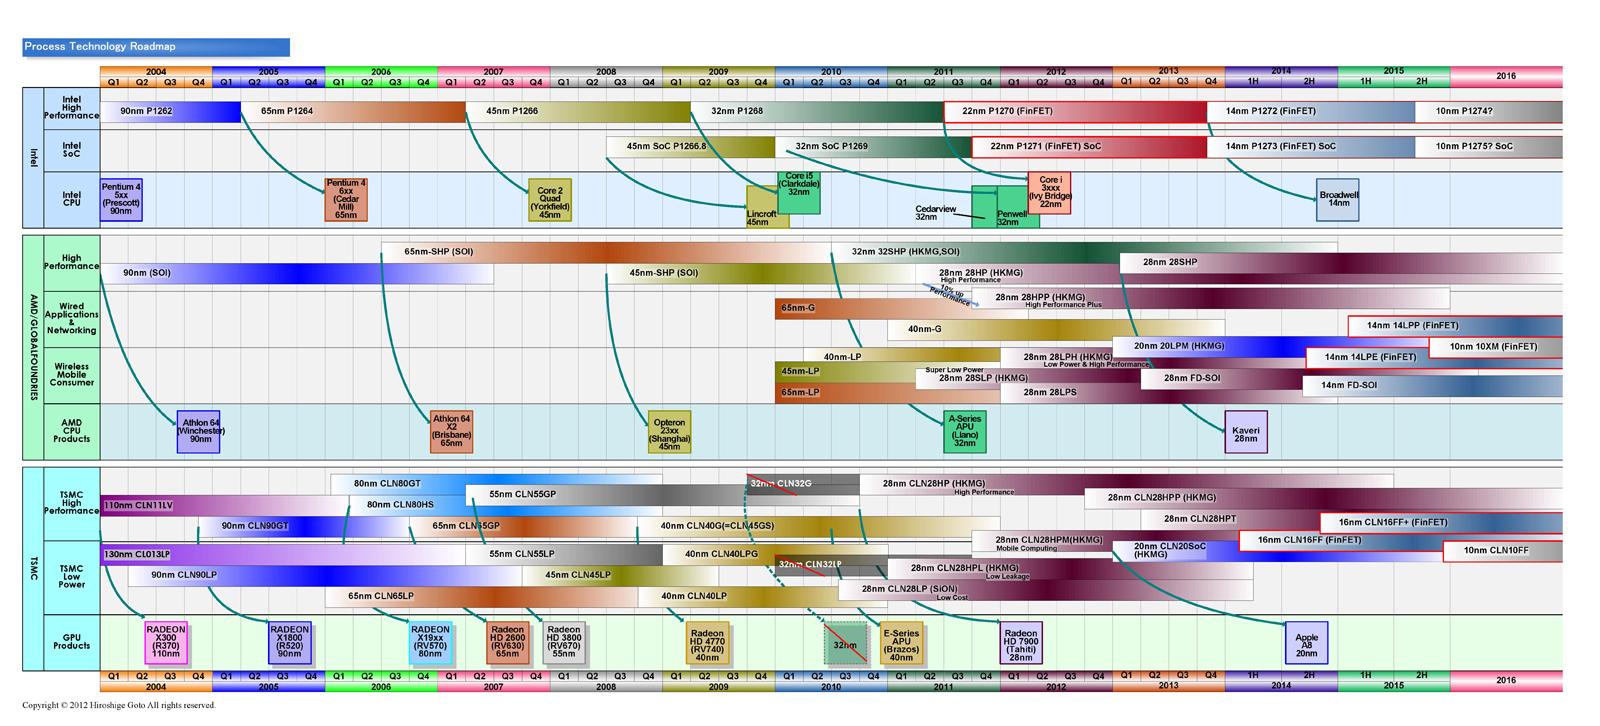 "Intelとファウンダリのプロセスルールロードマップ<br class="""">PDF版は<span class=""img-inline raw""><a href=""/video/pcw/docs/667/216/p6.pdf"" ipw_status=""1"" ipw_linktype=""filelink_raw"" class=""resource"">こちら</a></span>"